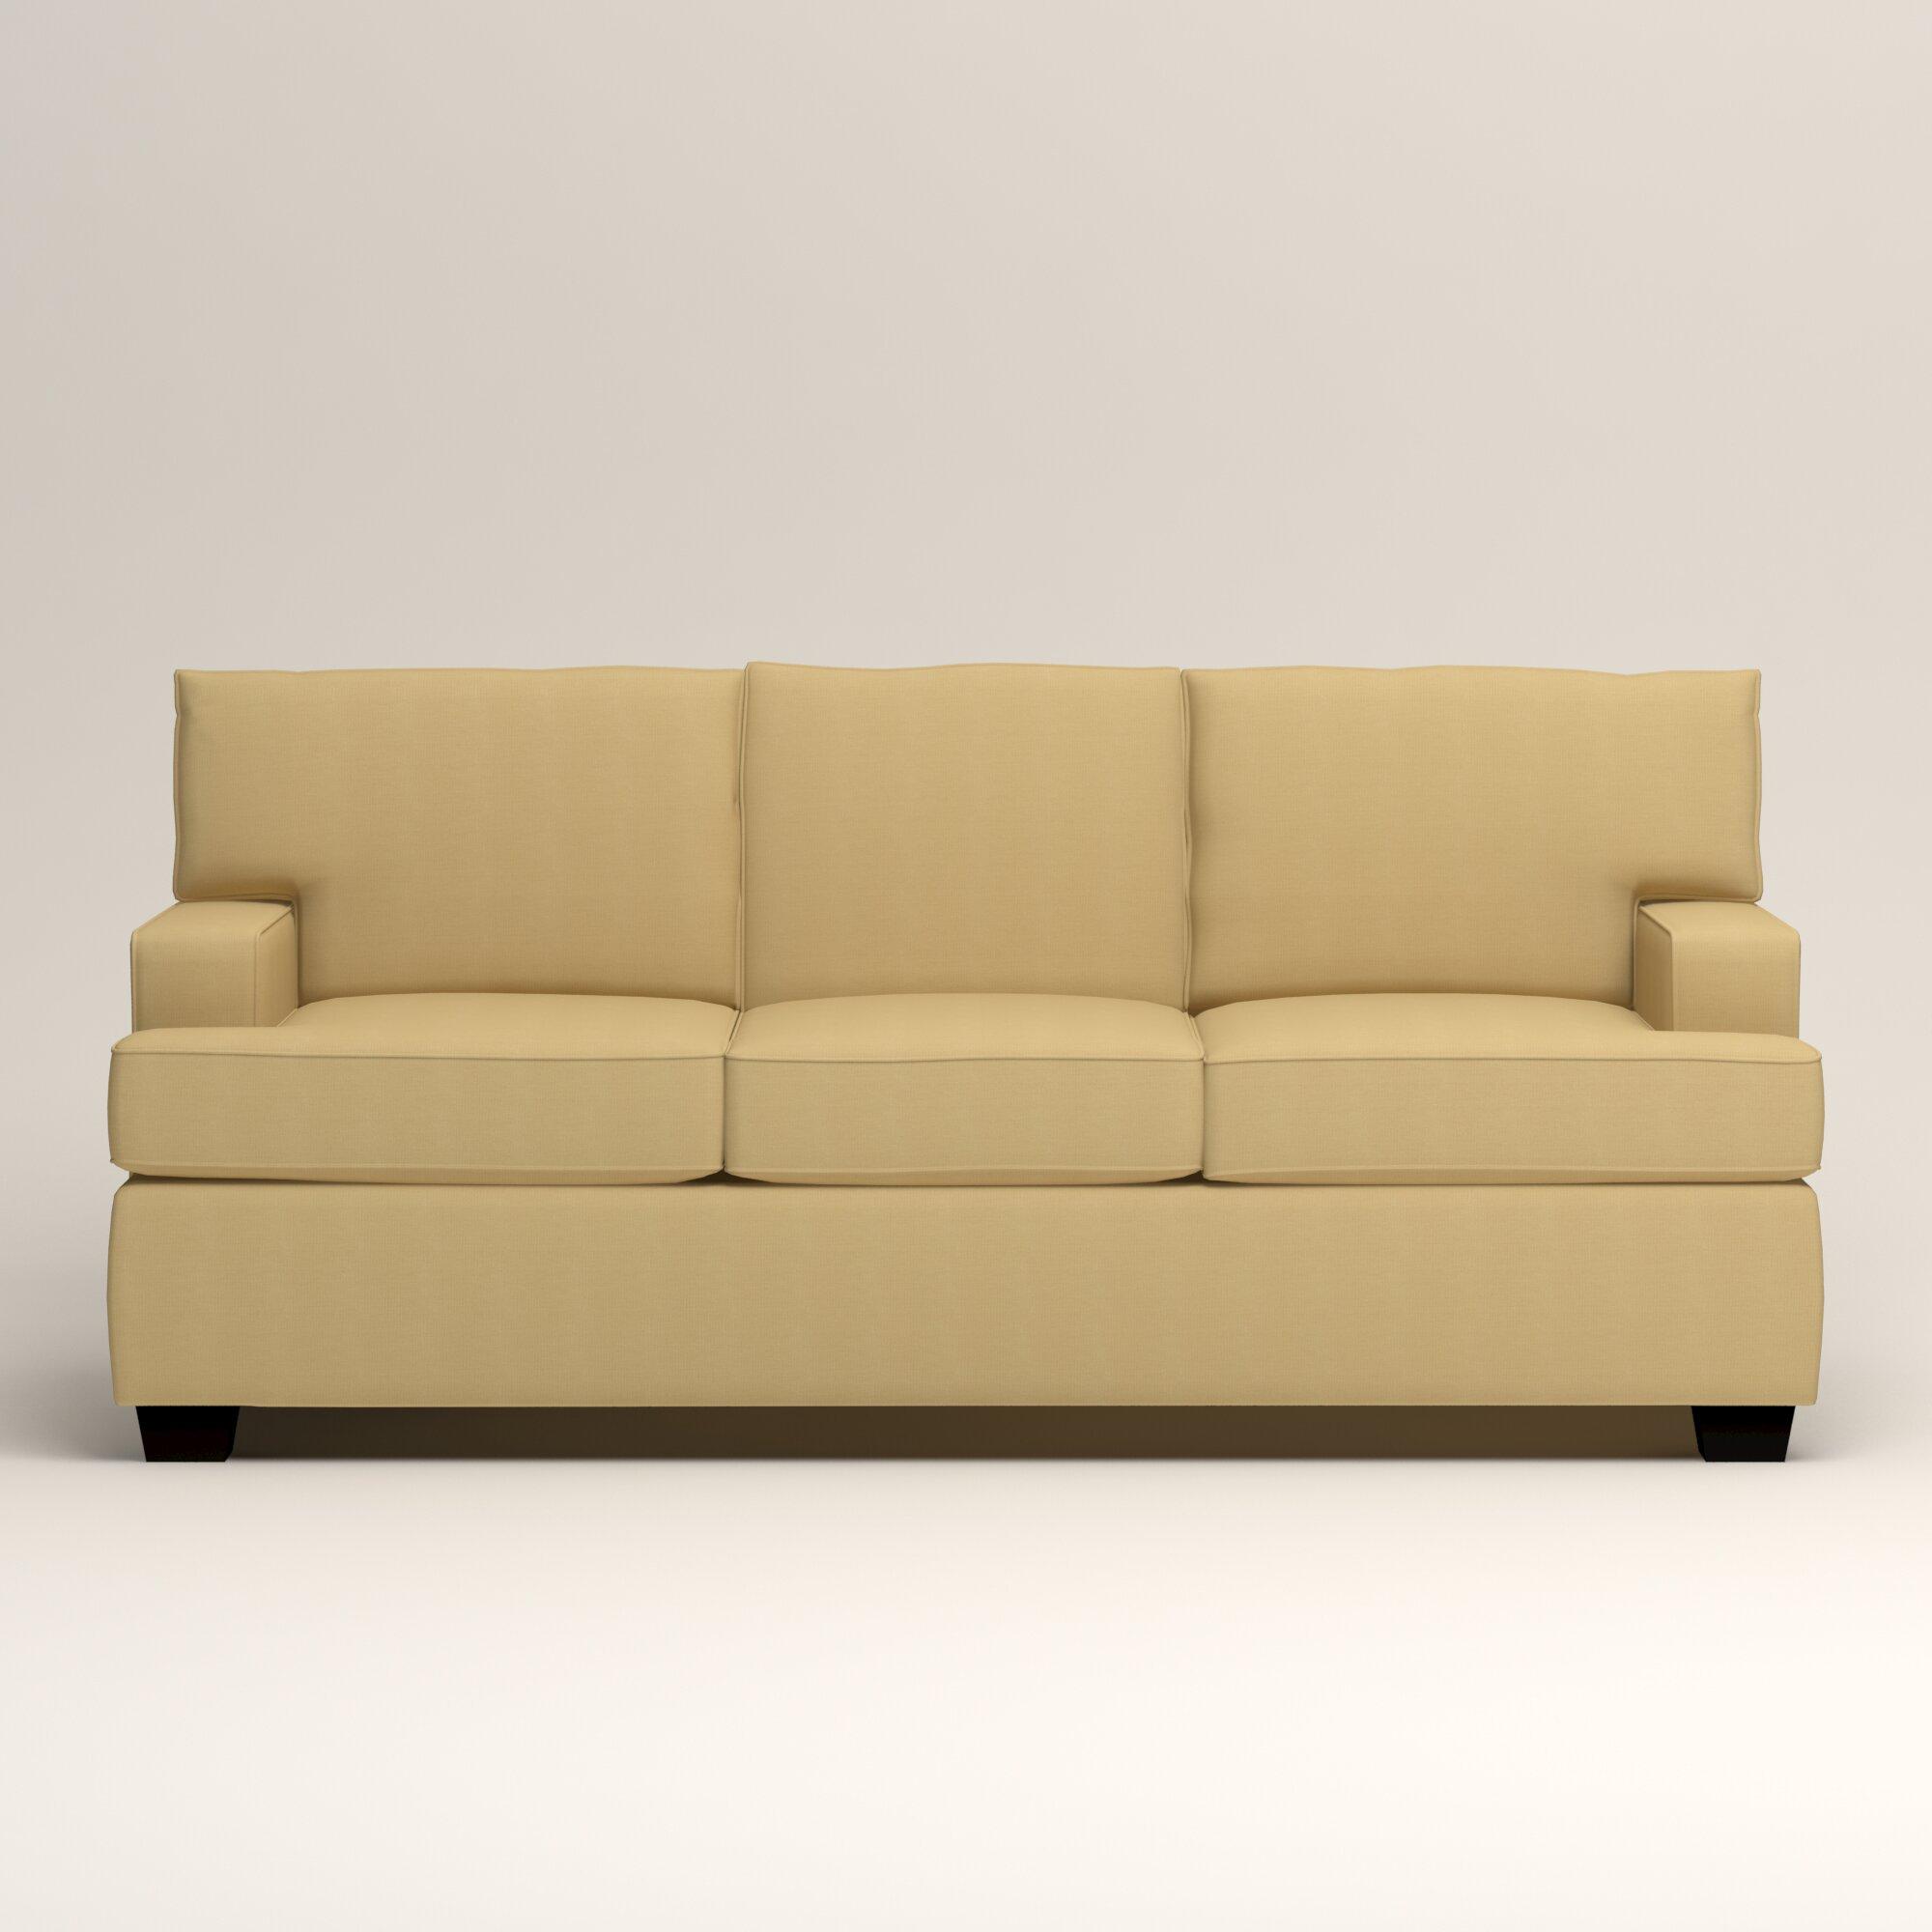 Birch lane clarkedale sleeper sofa reviews wayfair for Lane sectional sleeper sofa